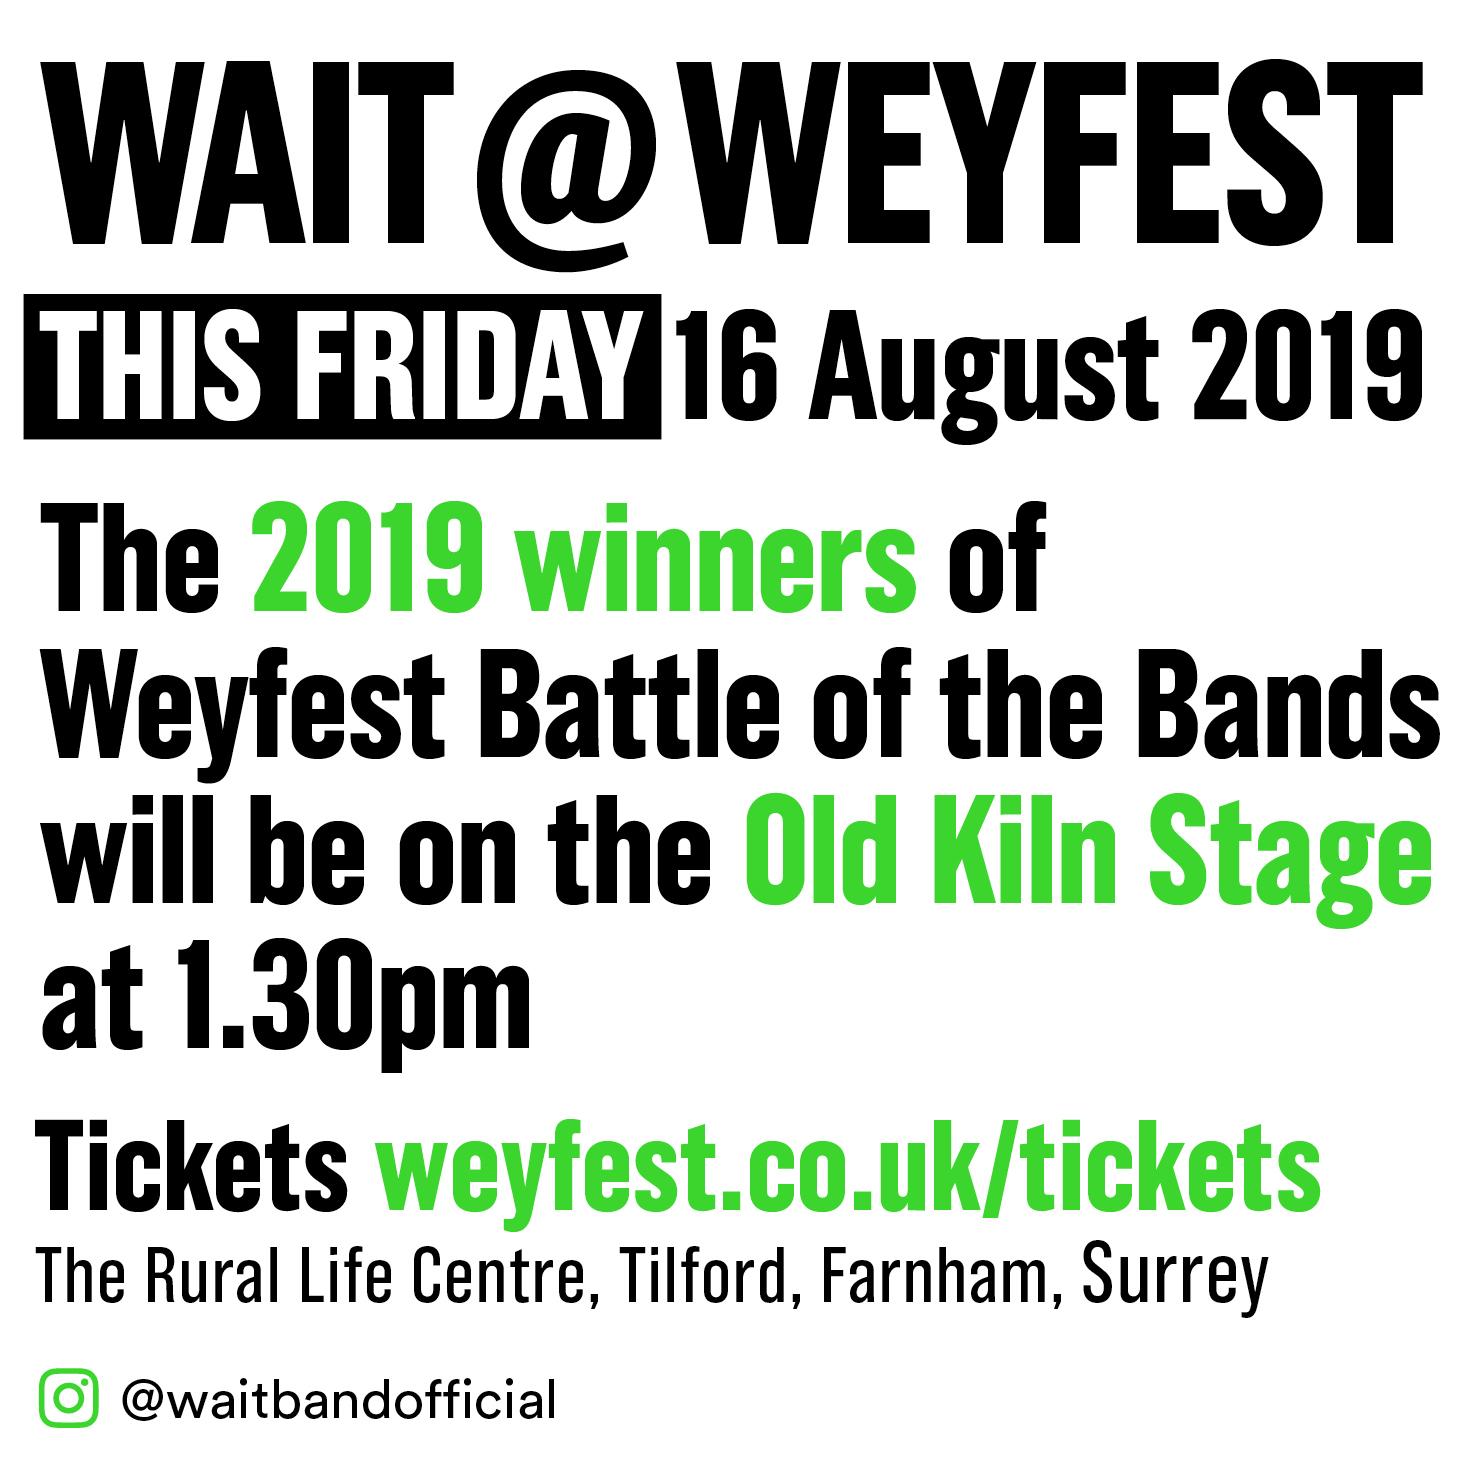 WAIT_Insta_poster_WeyFest_16_August_2019_v1.jpg